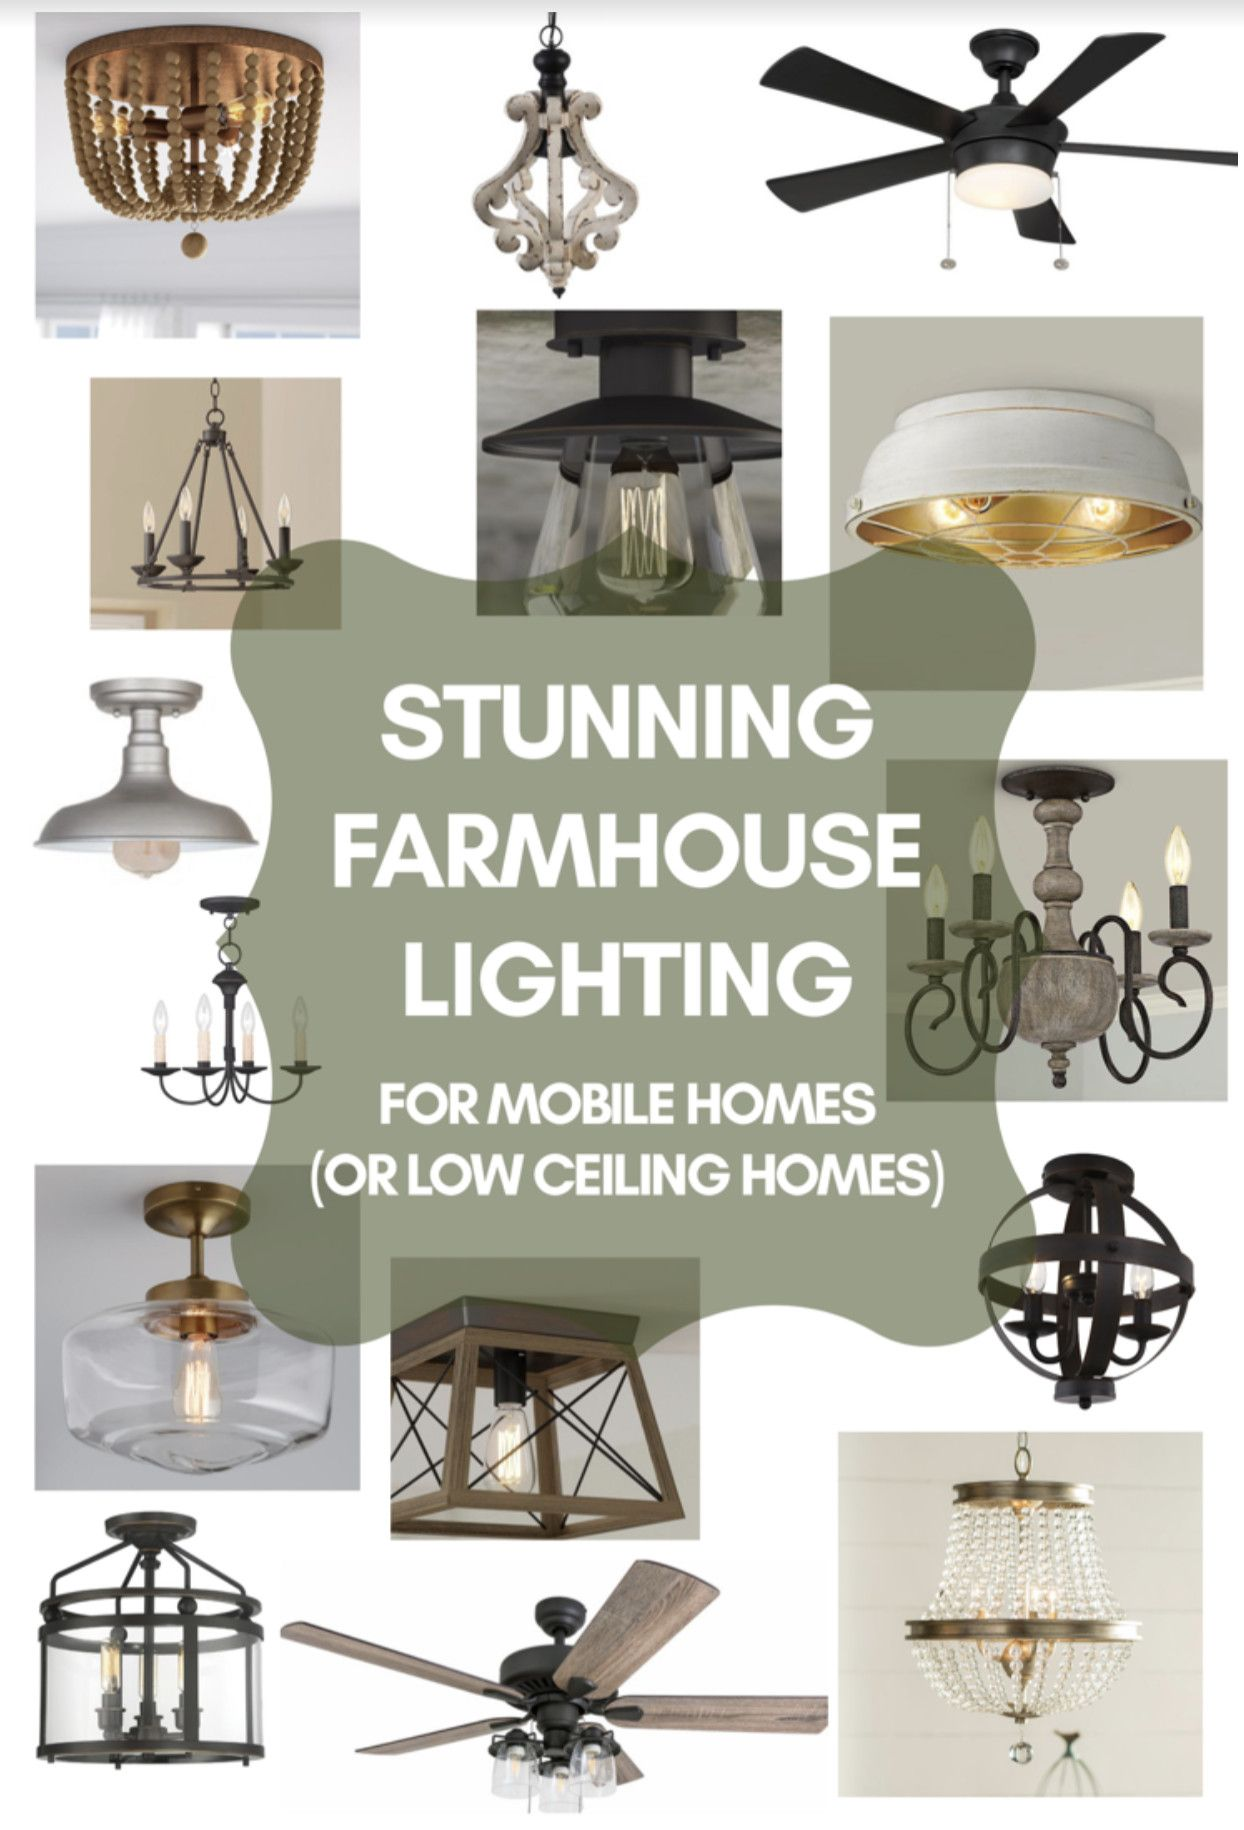 15 Stunning Farmhouse Style Light Fixtures For Low Ceilings Farmhouse Light Fixtures Low Ceiling Lighting Farmhouse Style Lighting